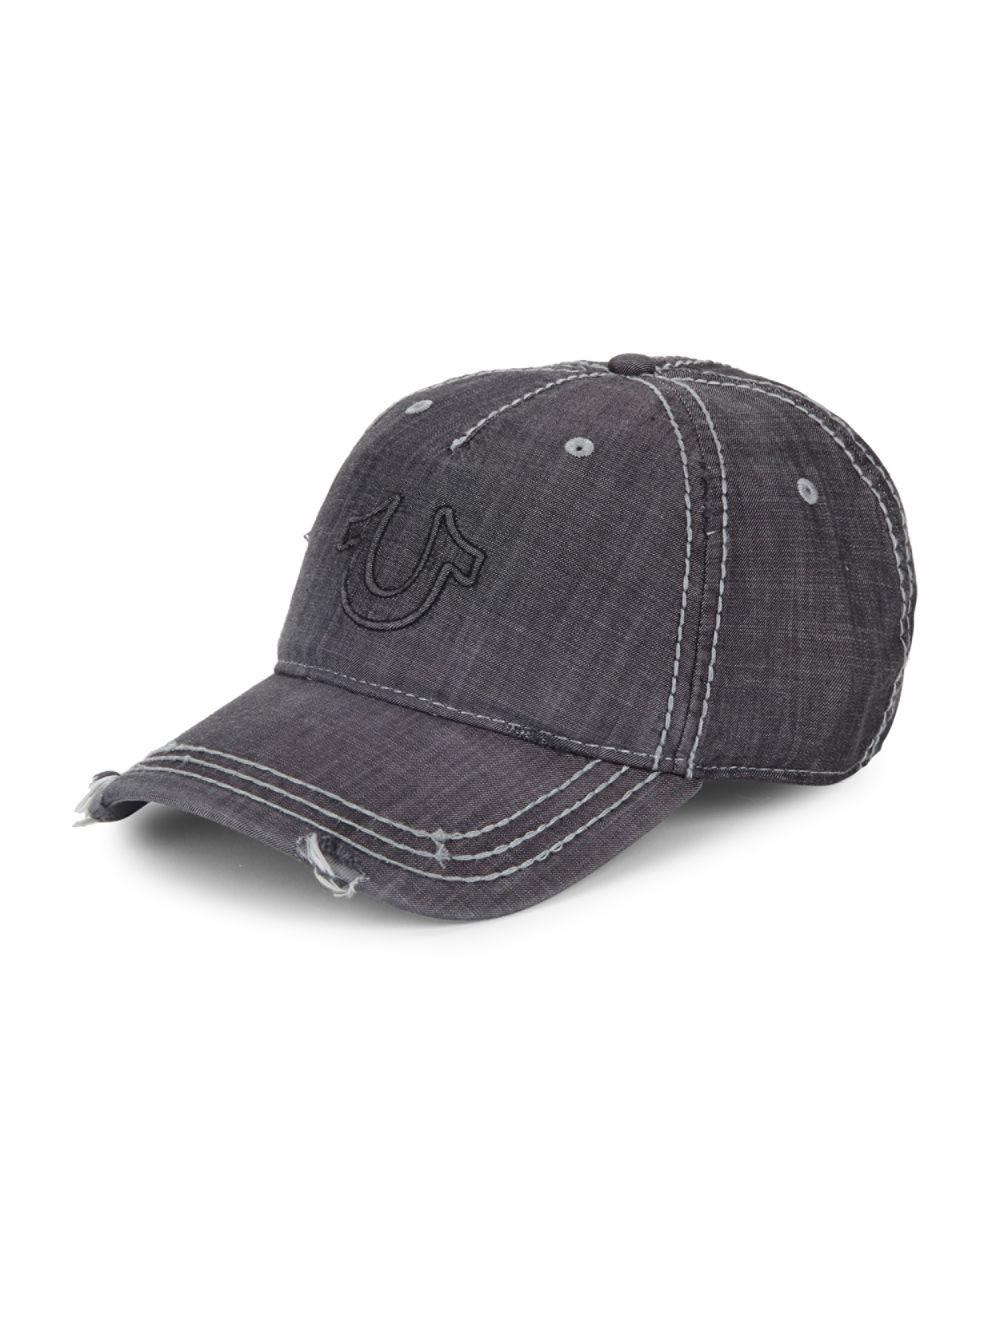 364a1aa76df027 True Religion Distressed Horseshoe Logo Baseball Cap in Black for ...